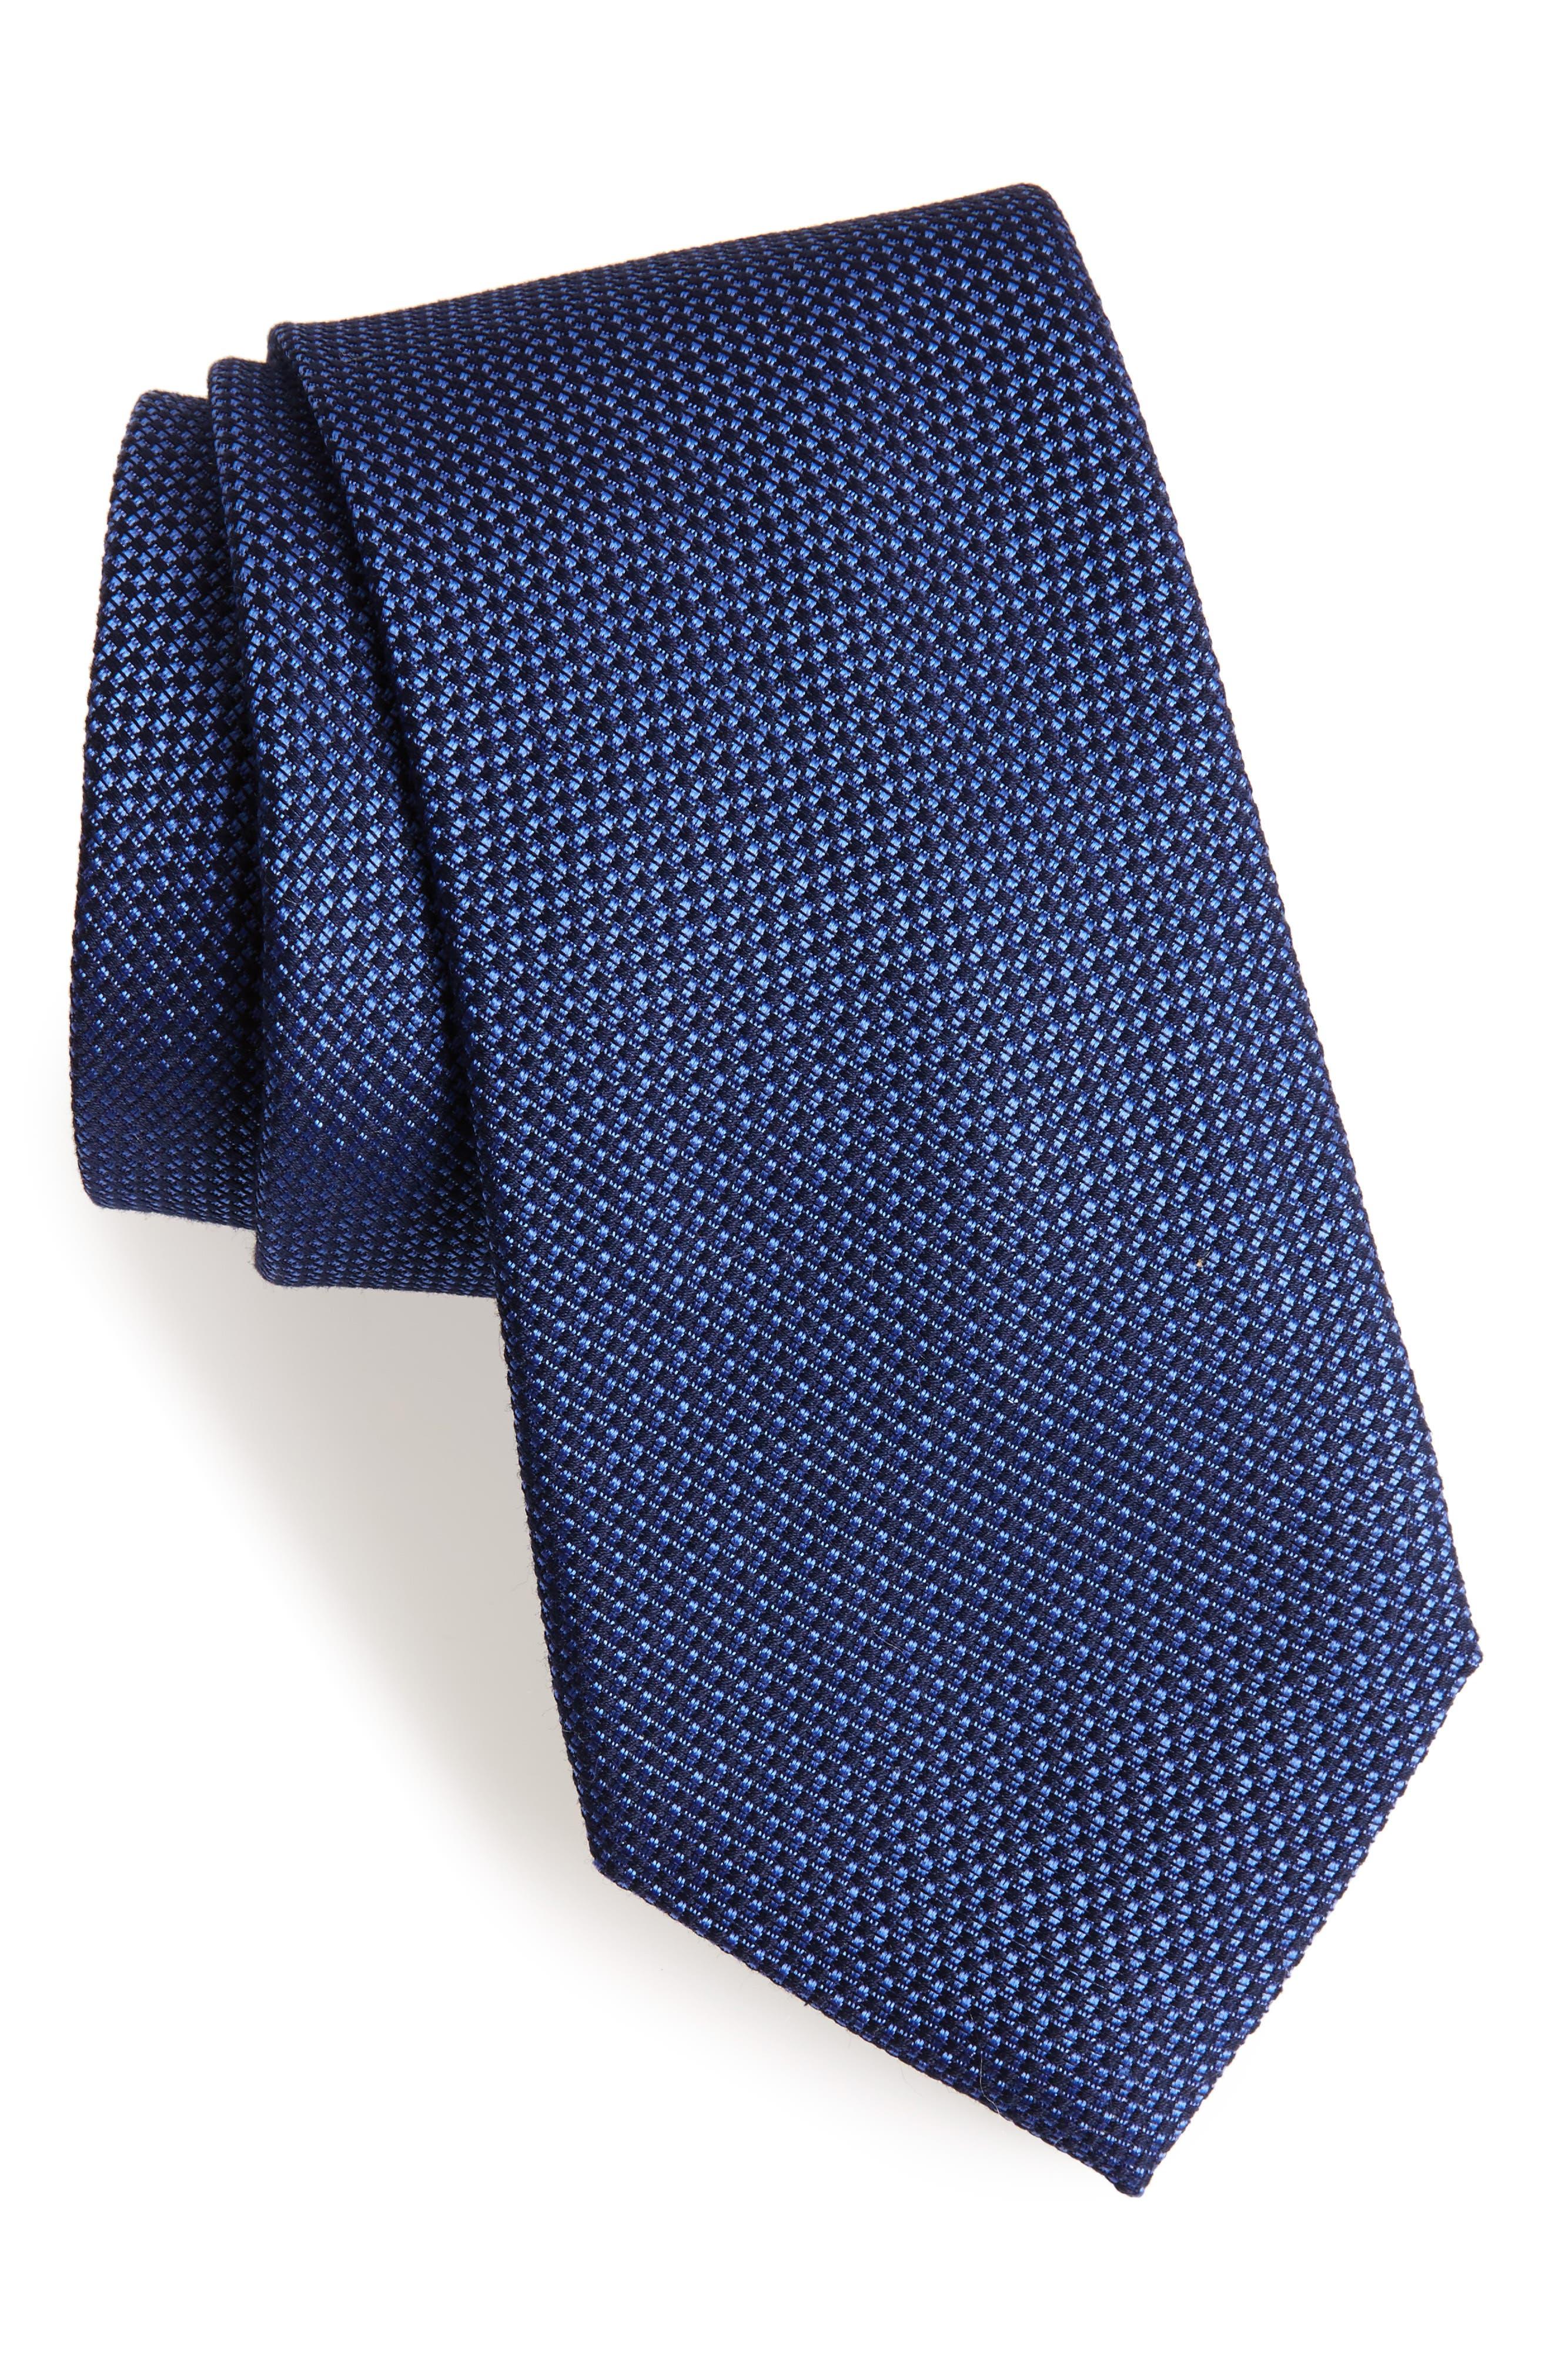 Main Image - Calibrate Seedstitch Solid Cotton & Silk Tie